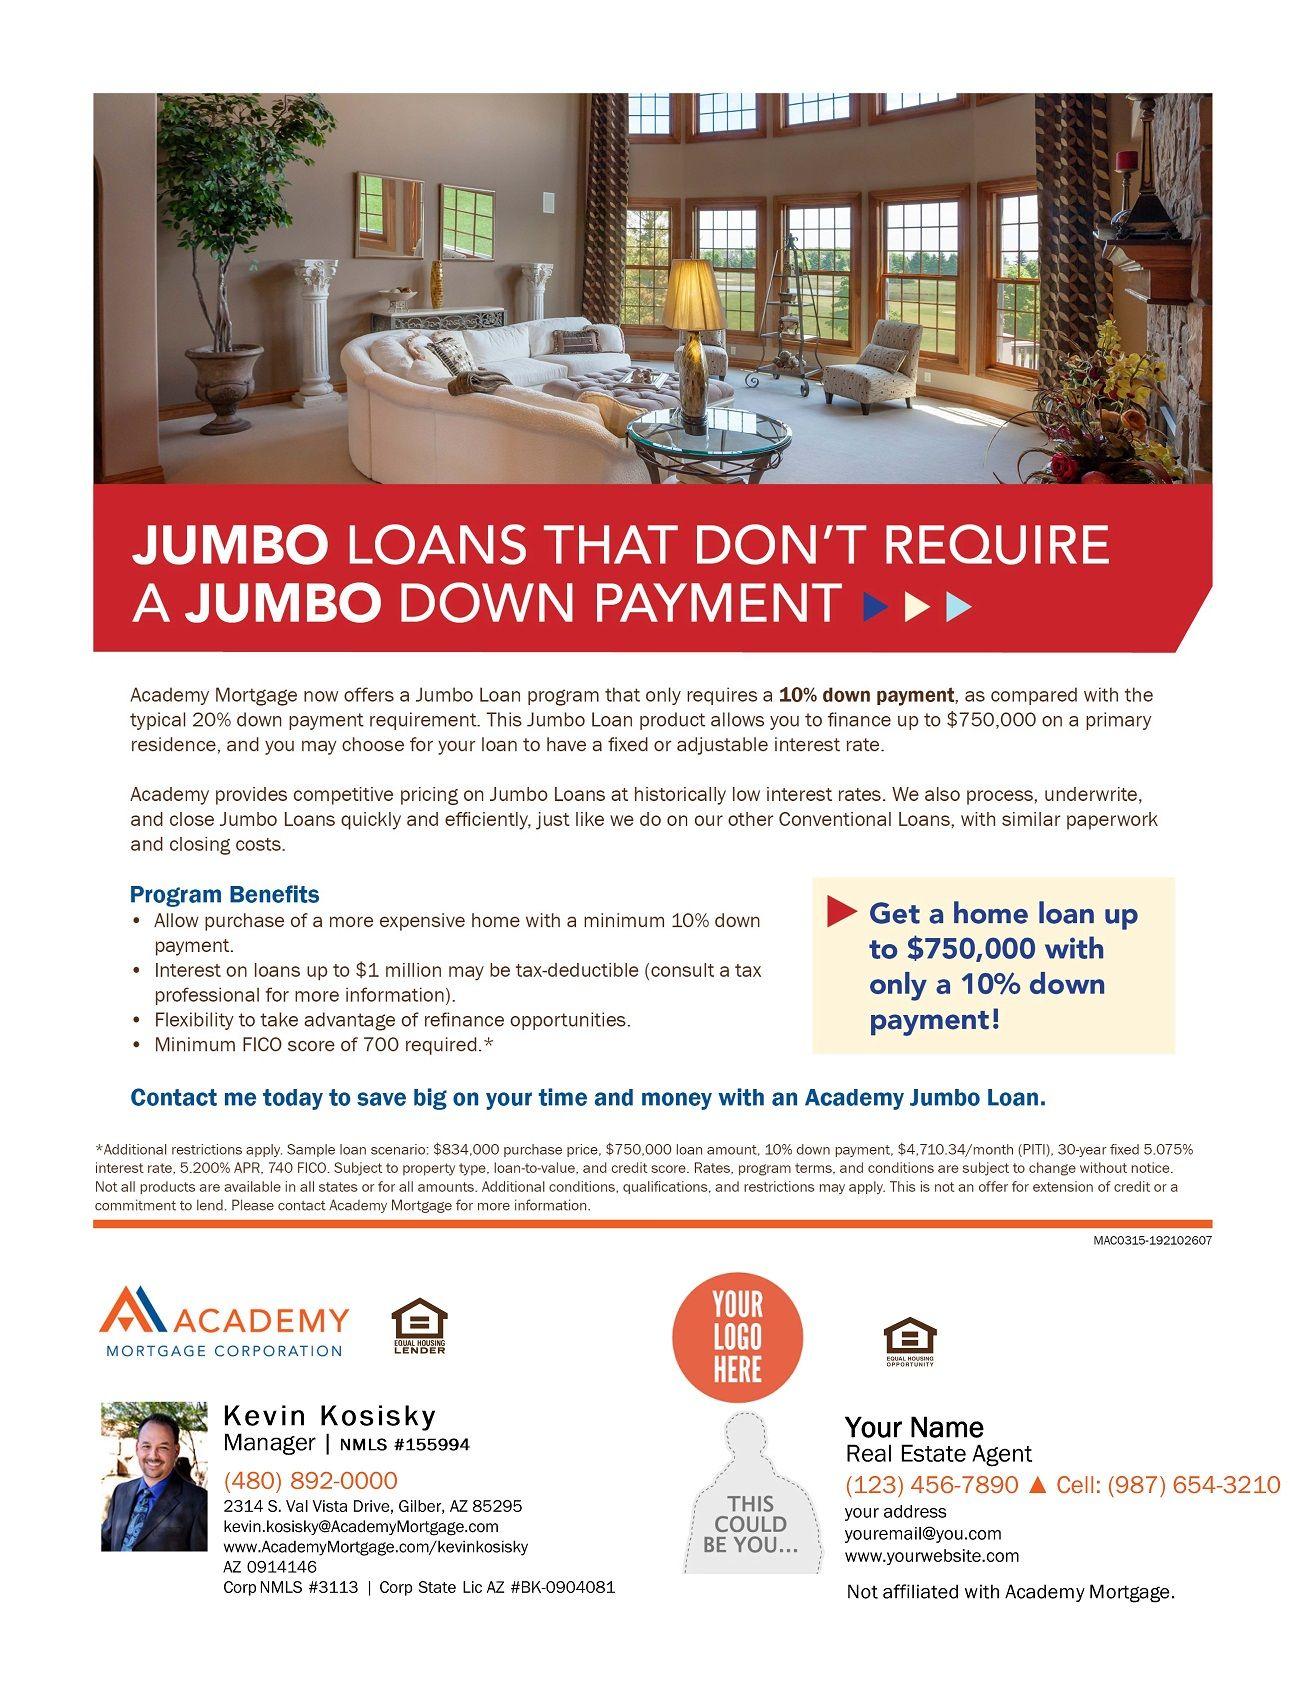 Jumbo Loans | Loan Program Flyers | Pinterest | Jumbo loans